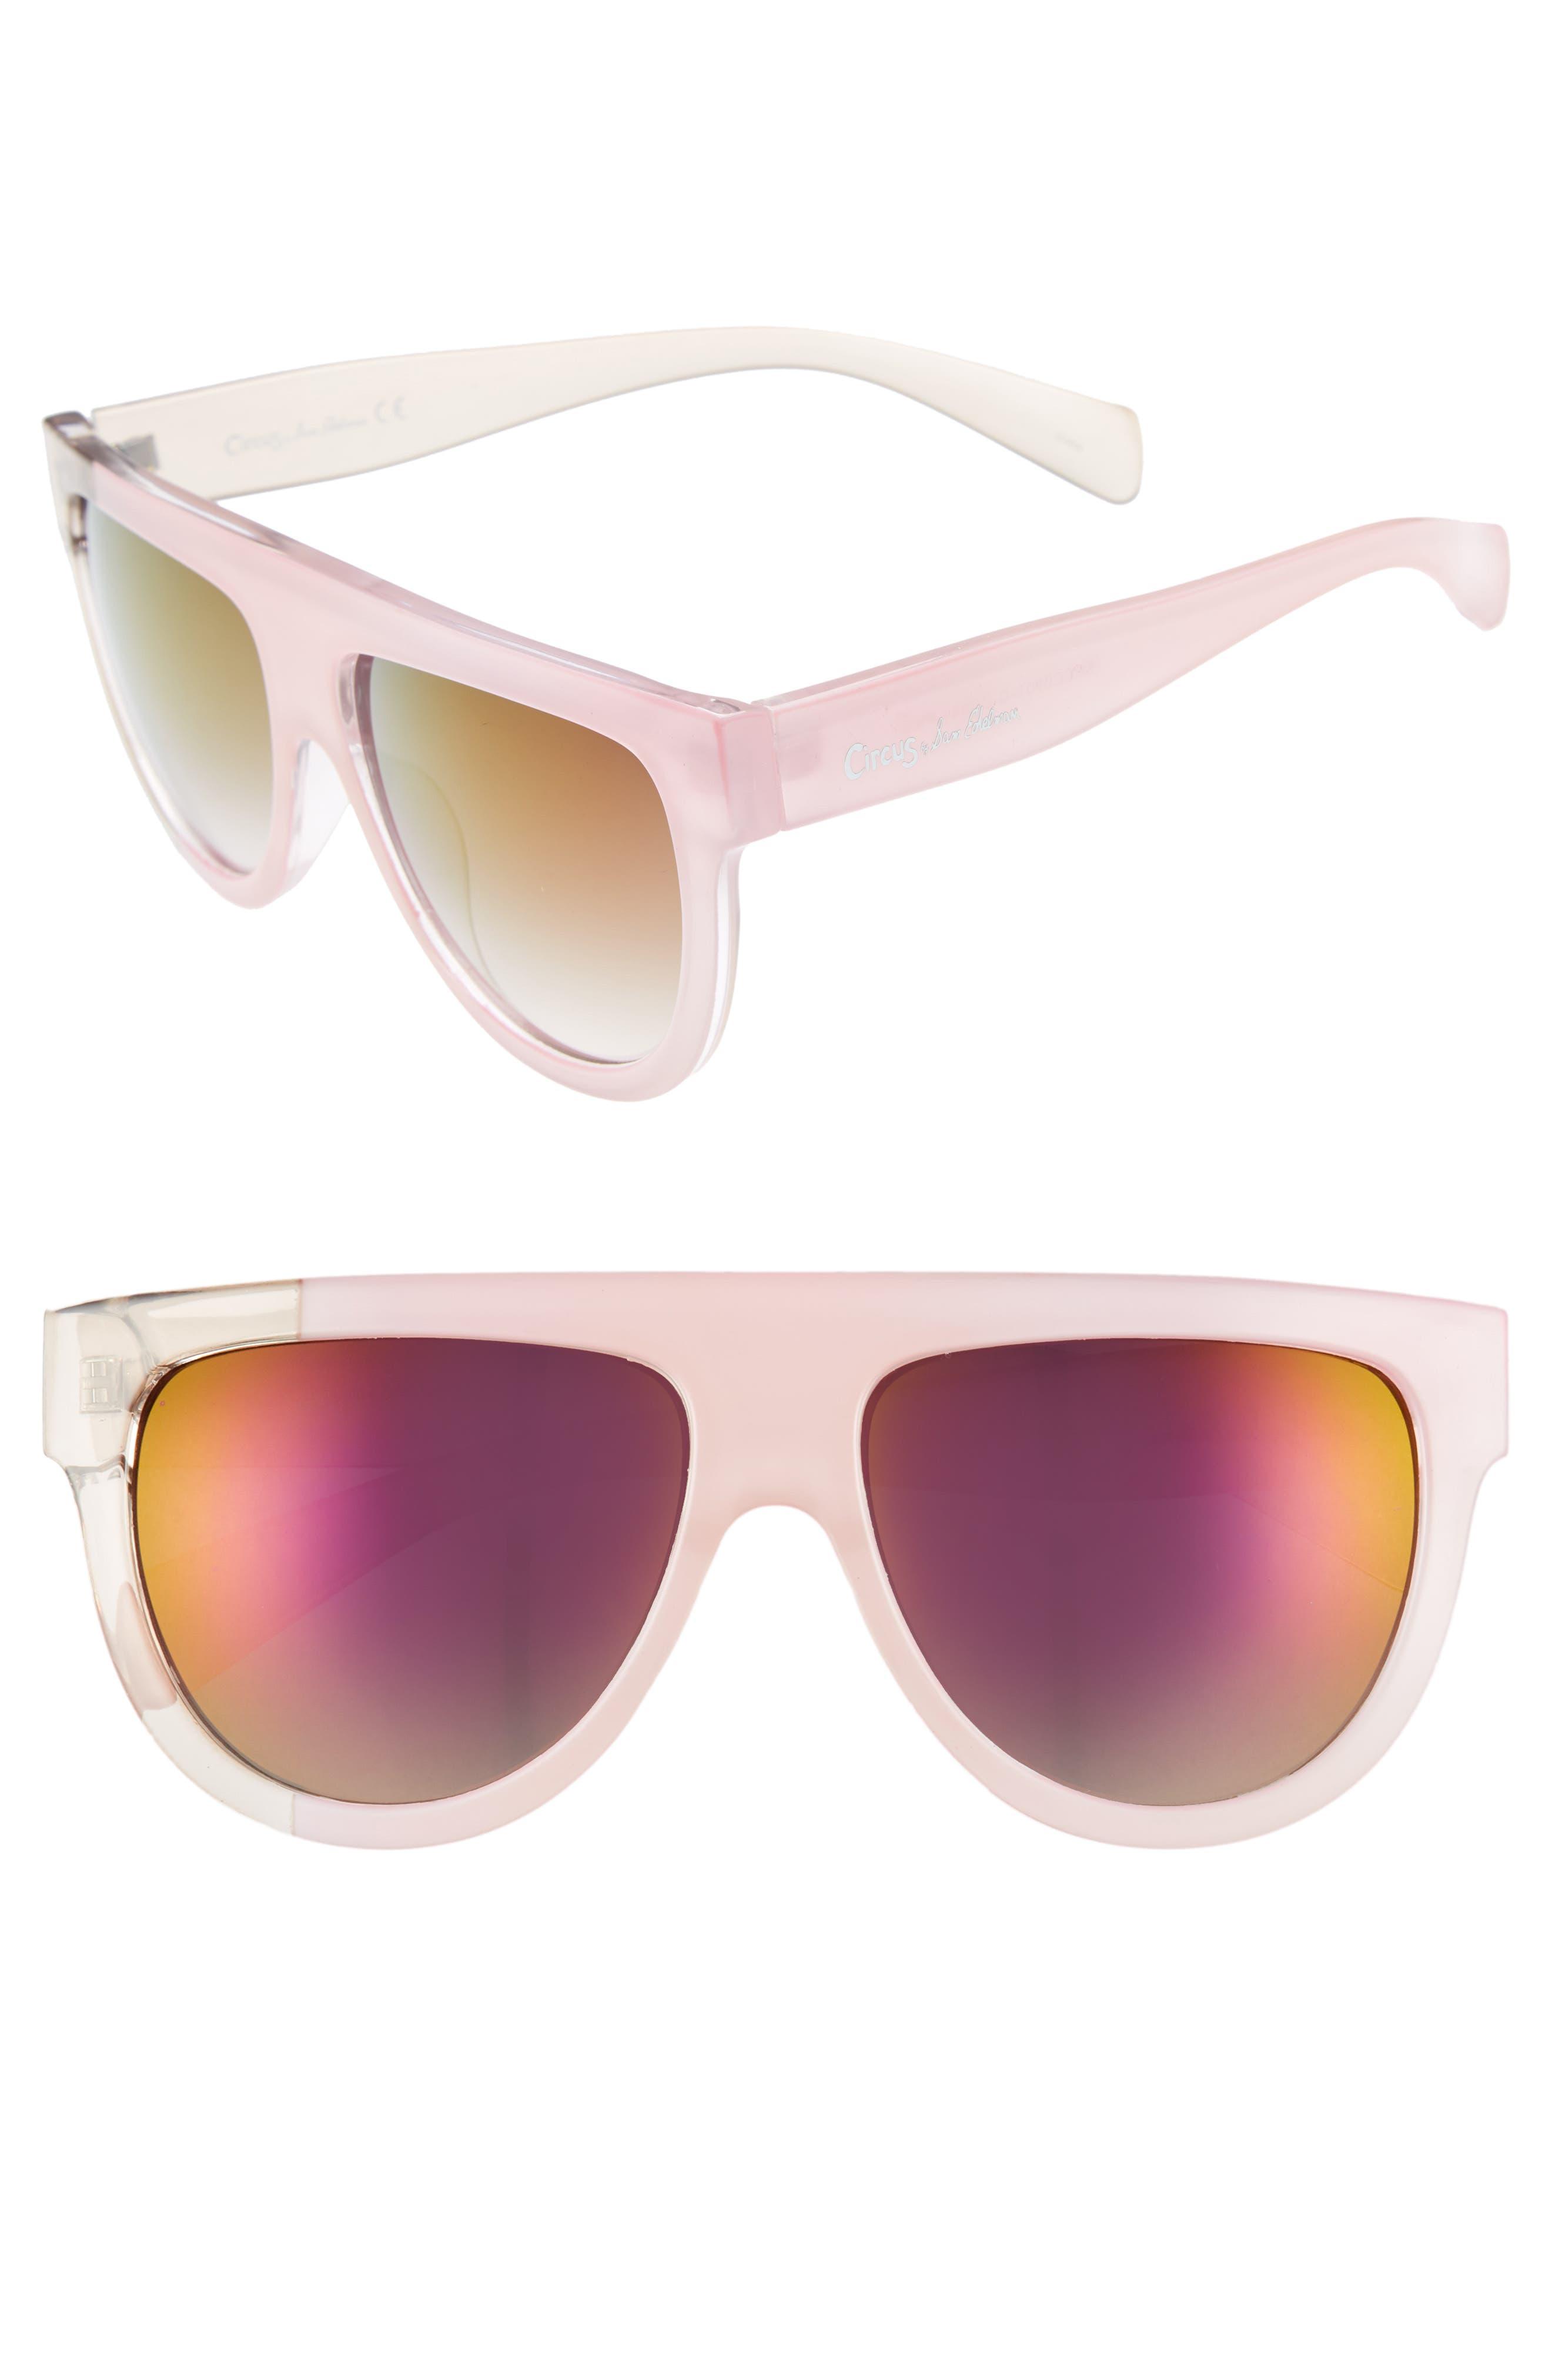 68mm Flat Top Sunglasses,                             Main thumbnail 2, color,